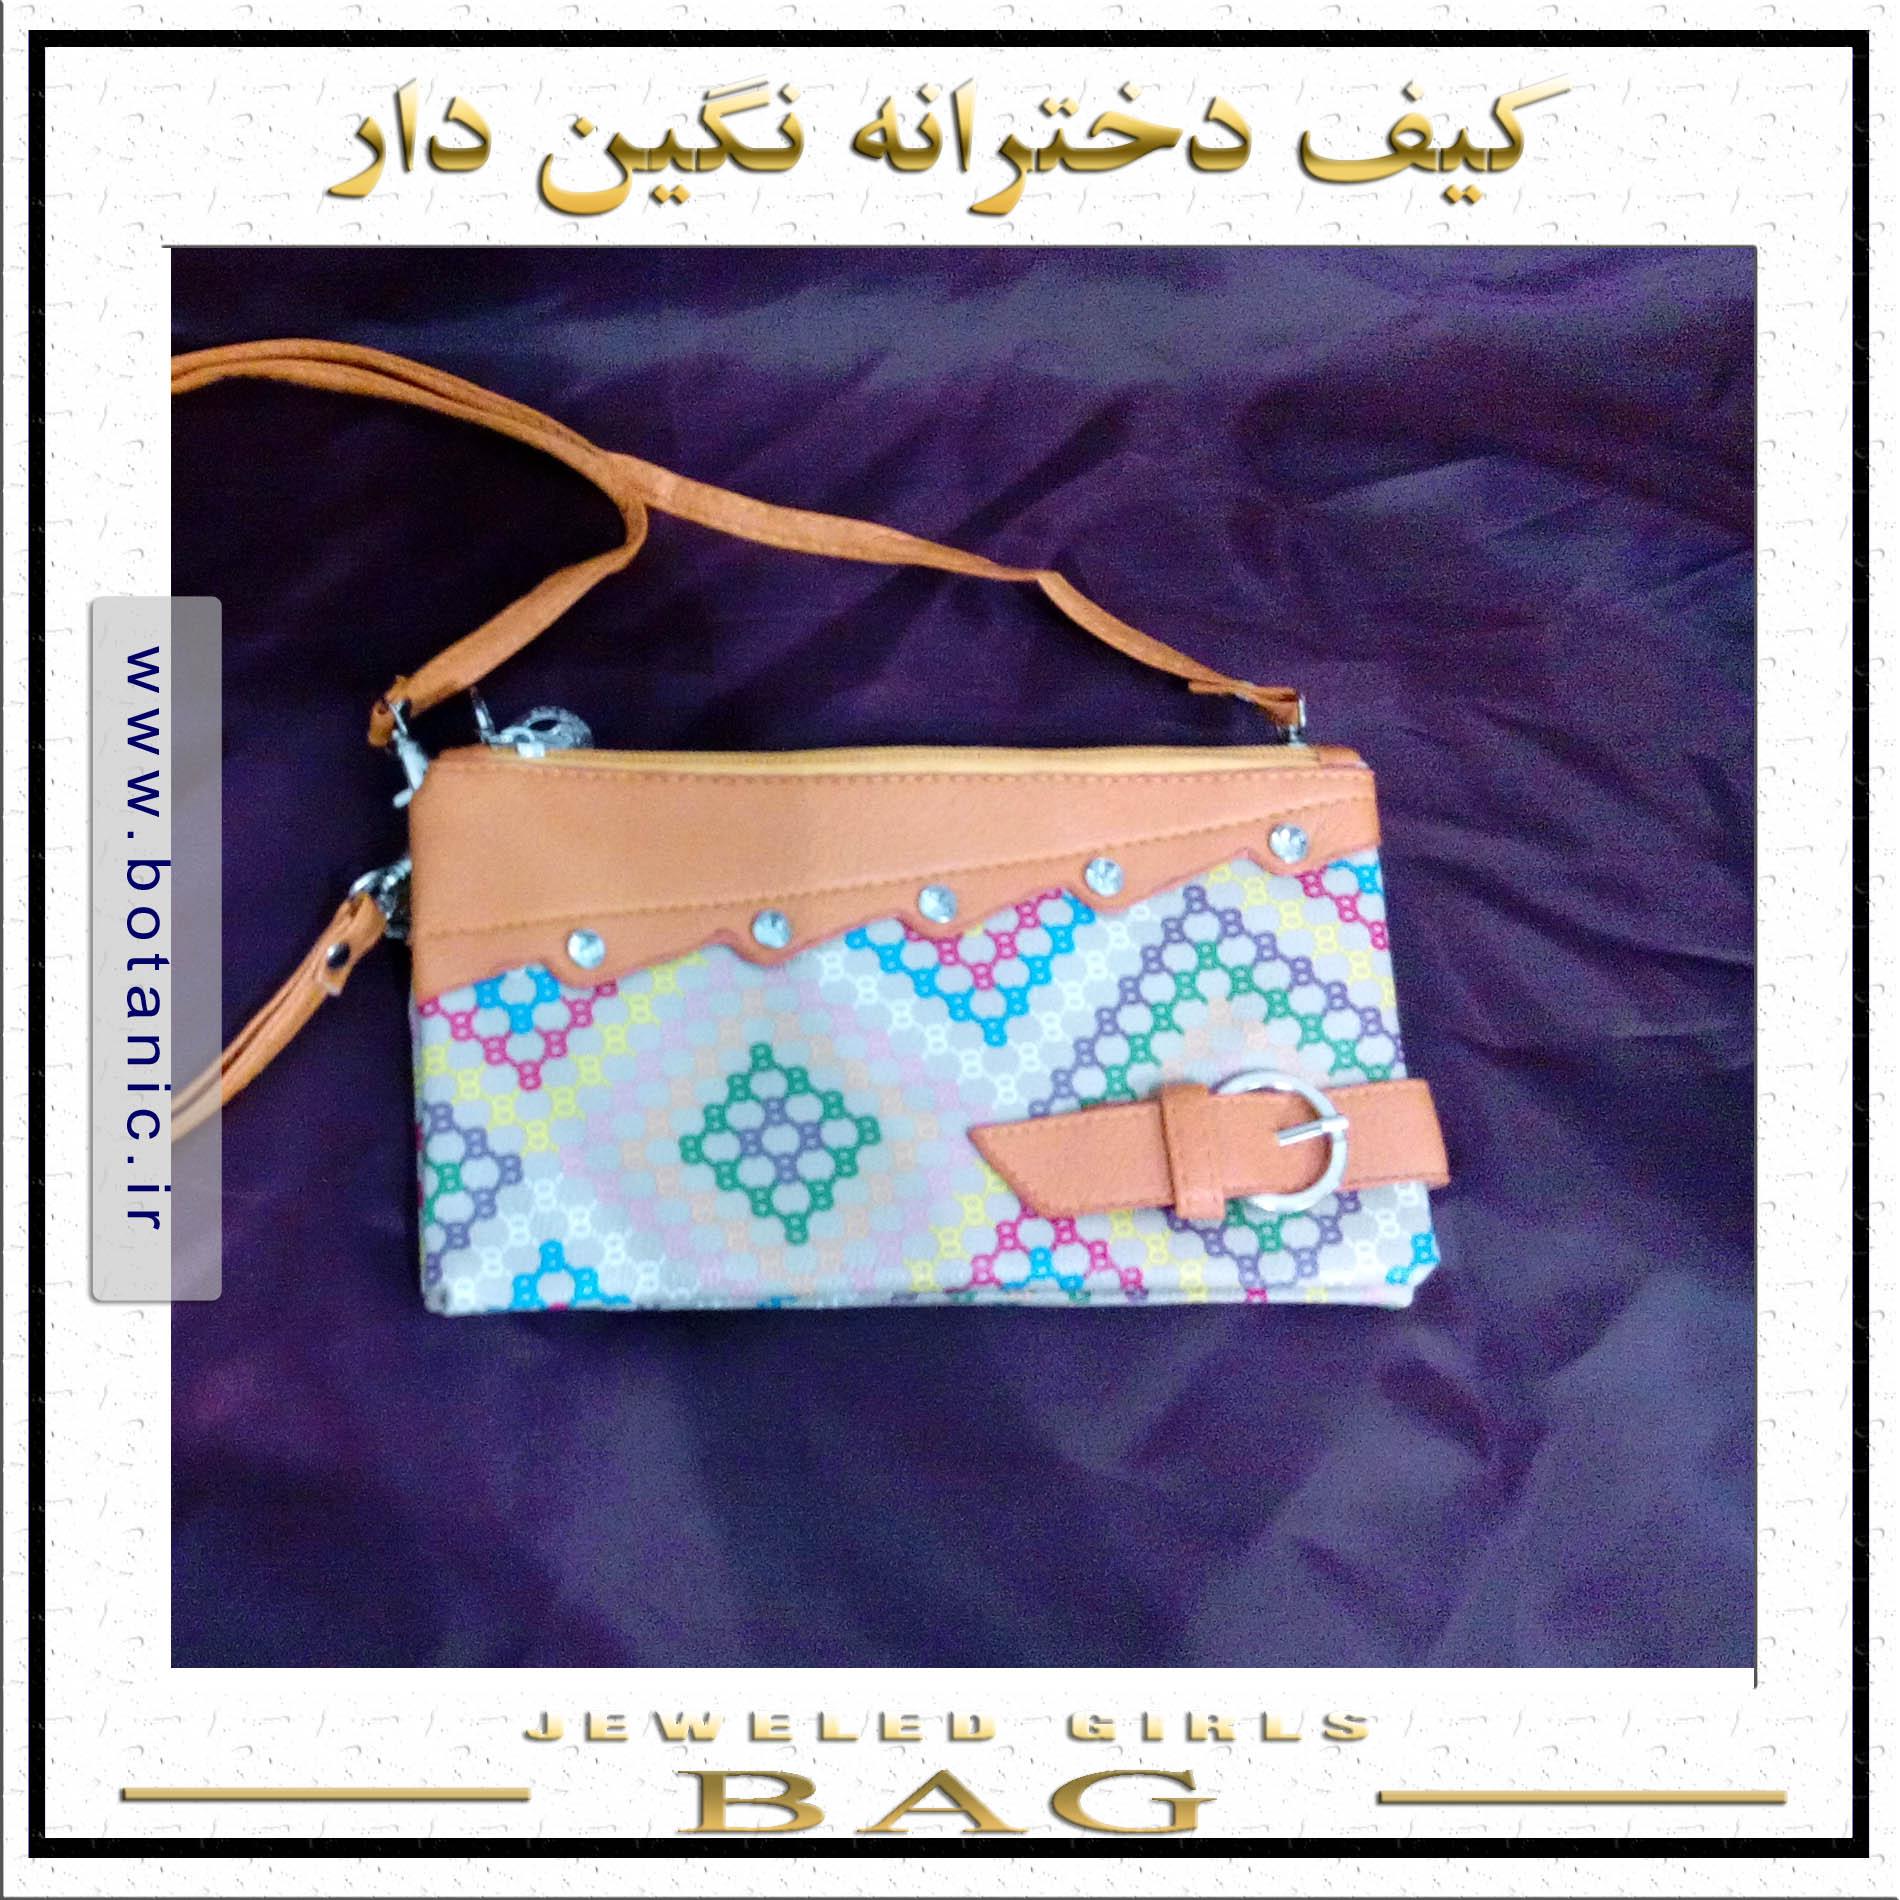 Jeweled Girls Bag